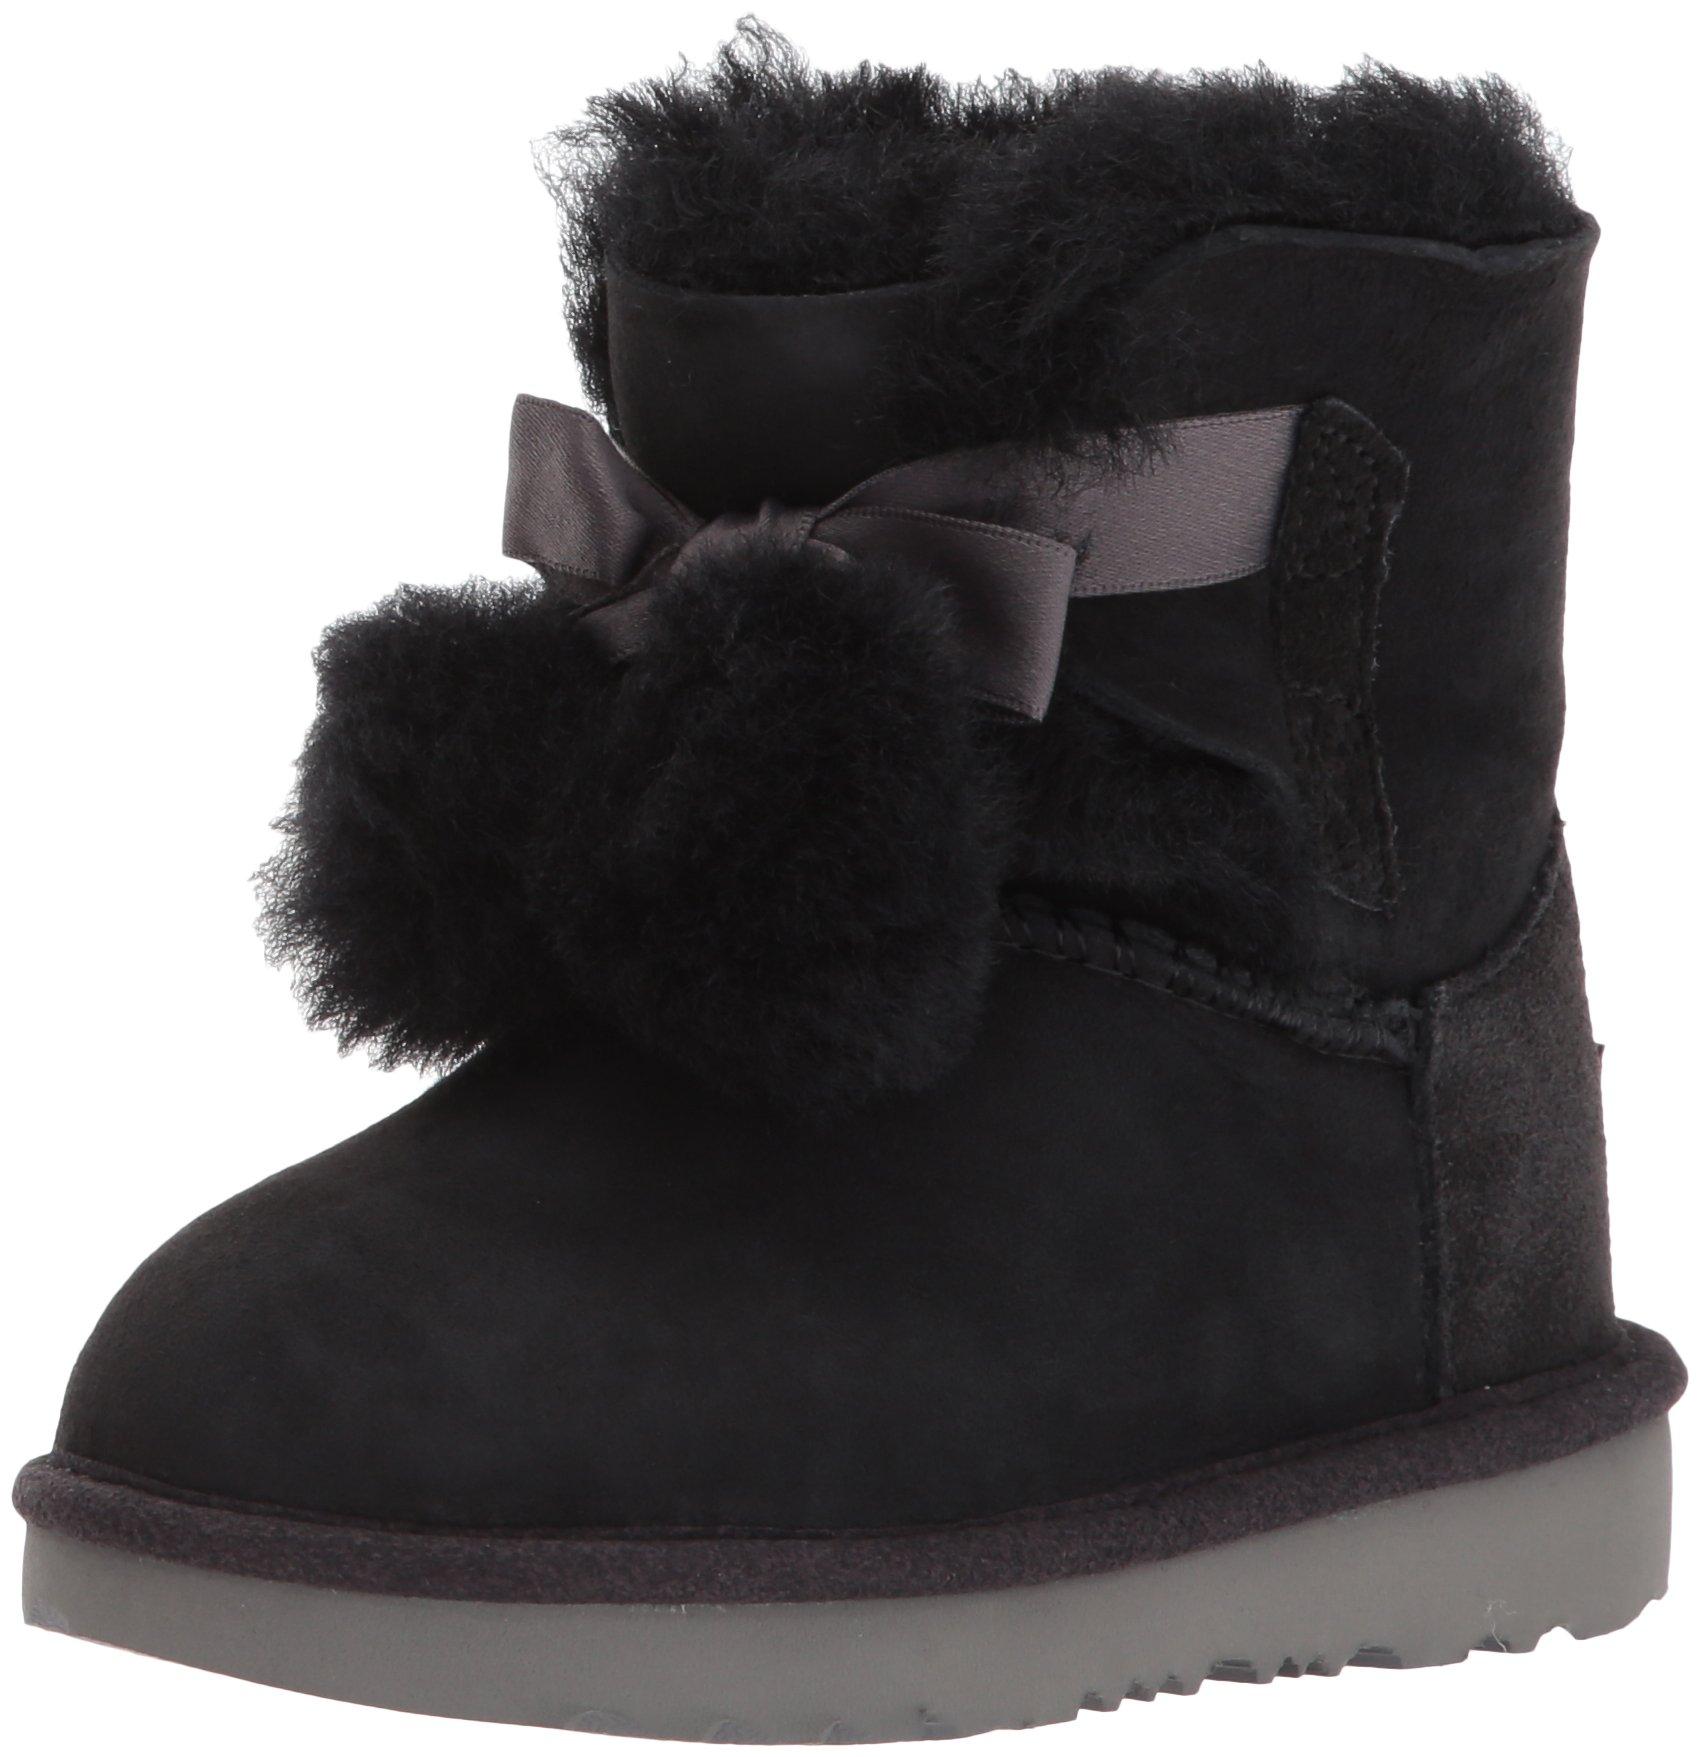 UGG Girls T Gita Pull-on Boot, Black, 7 M US Toddler